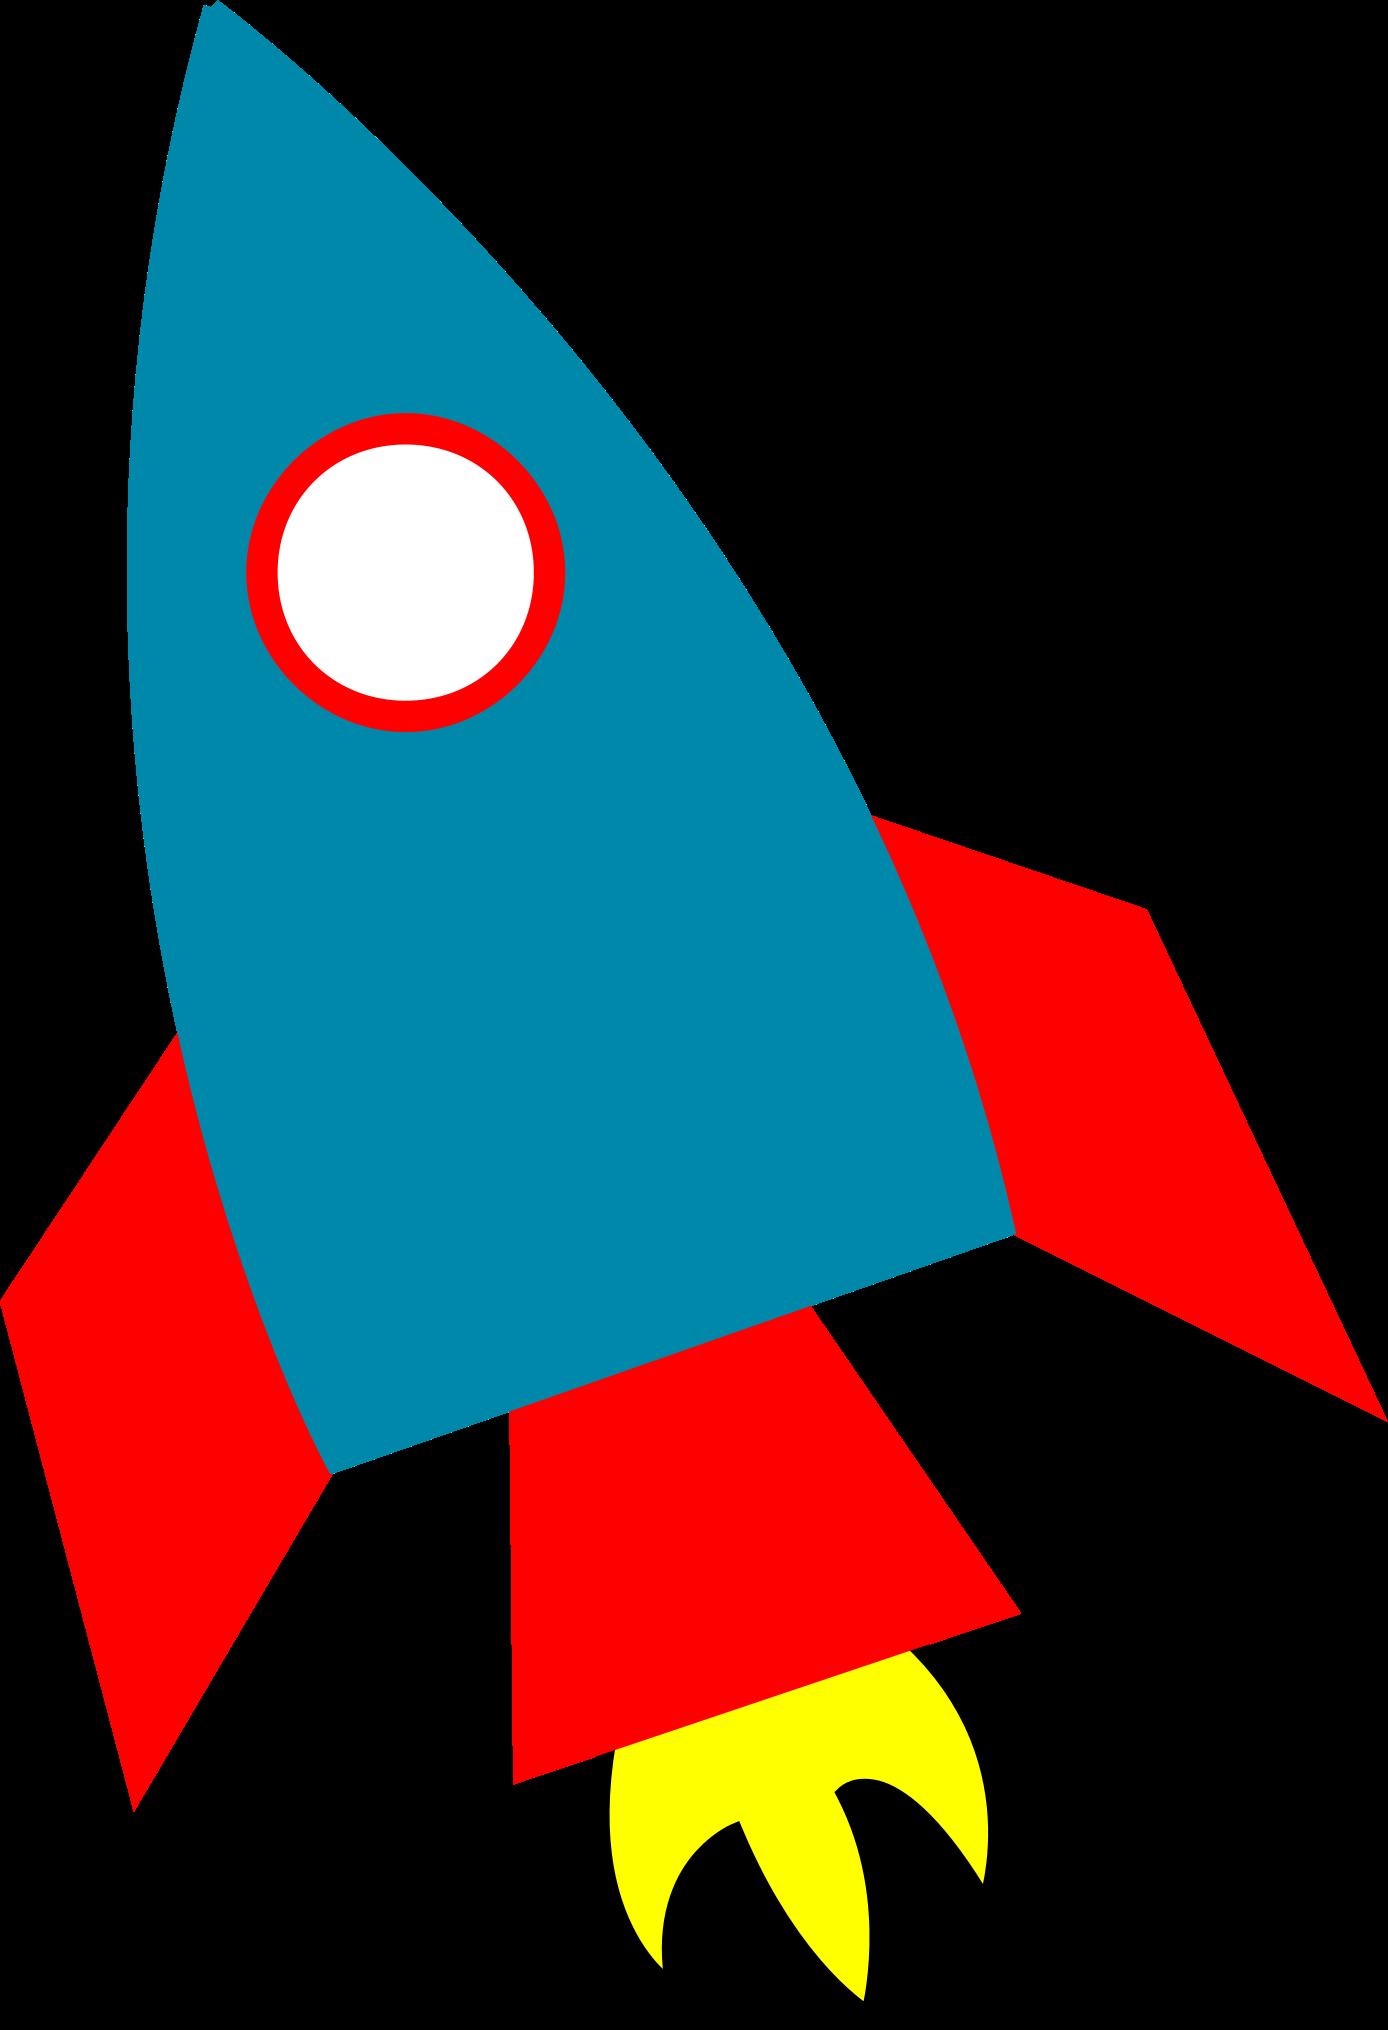 Шаблон для открытки ракета летит